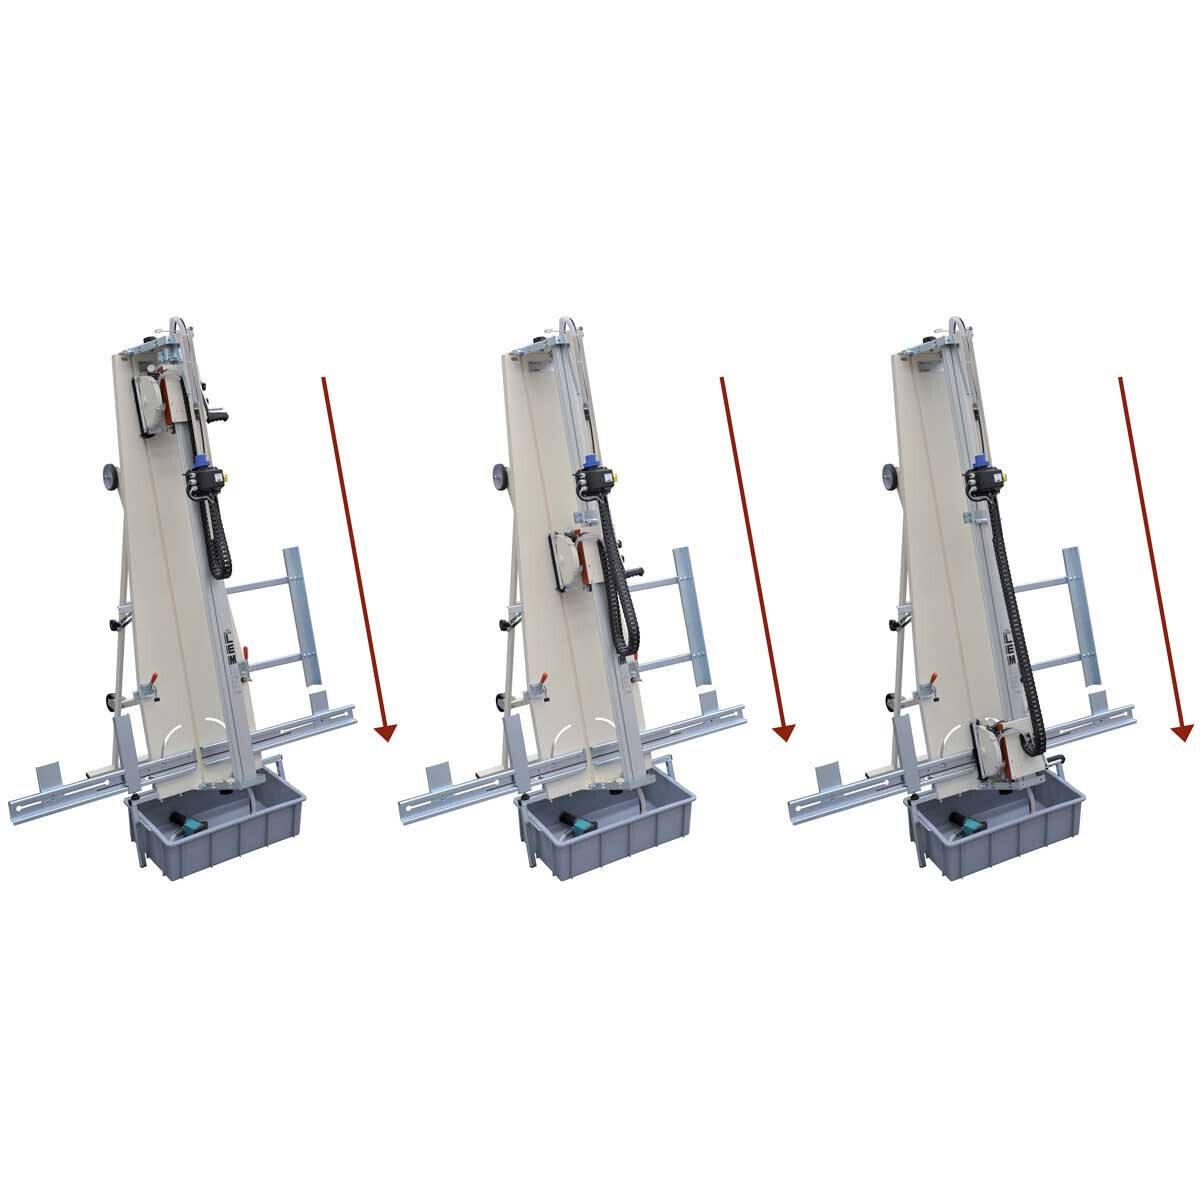 Raimondi LEM Vertical Wet Stone Motion